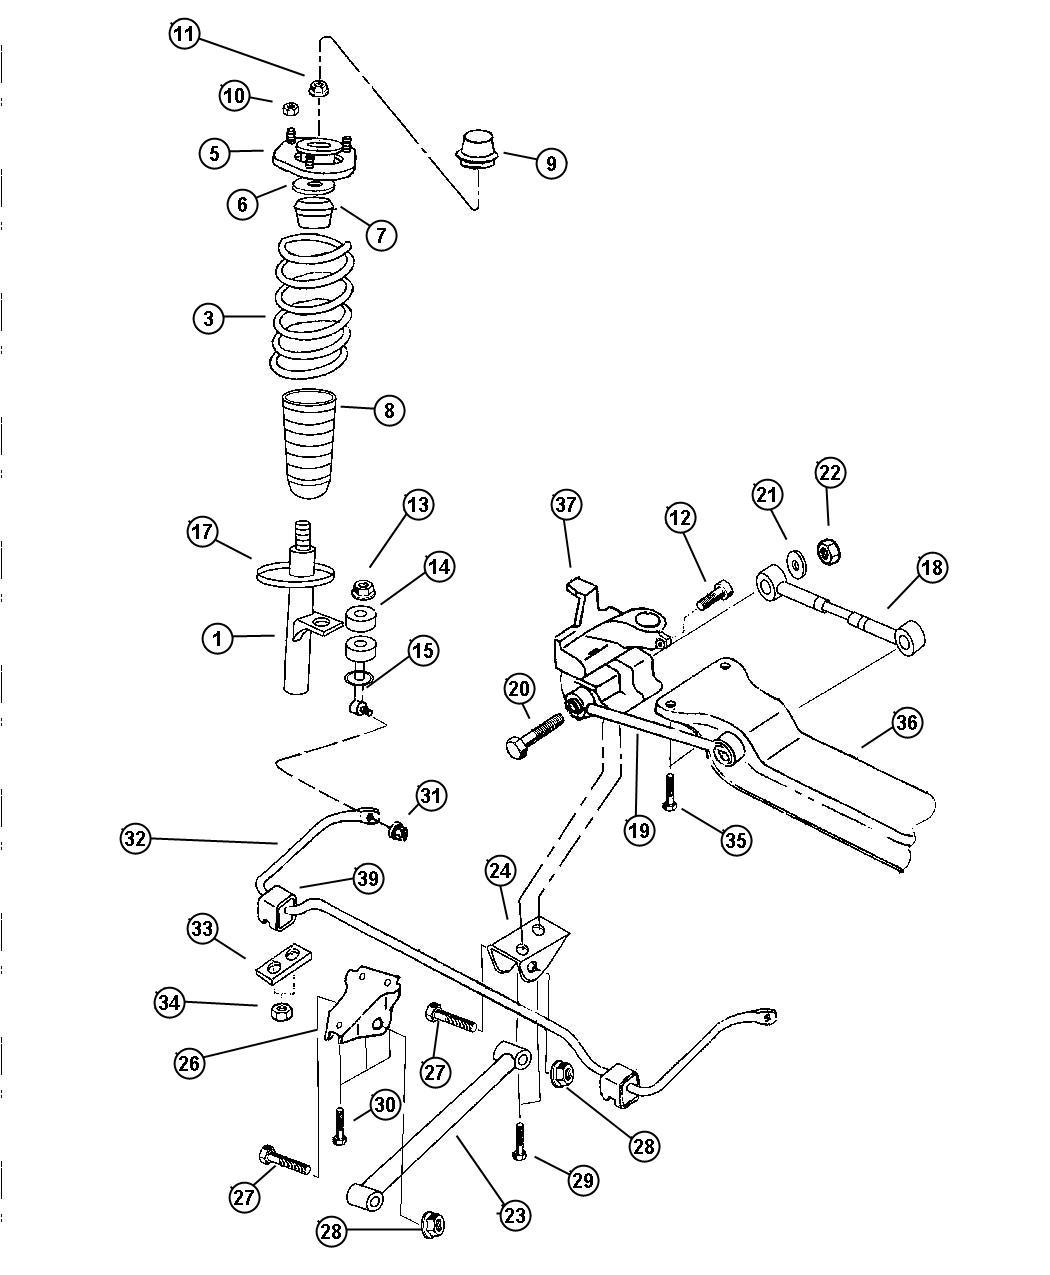 1999 chrysler lhs suspension diagrams